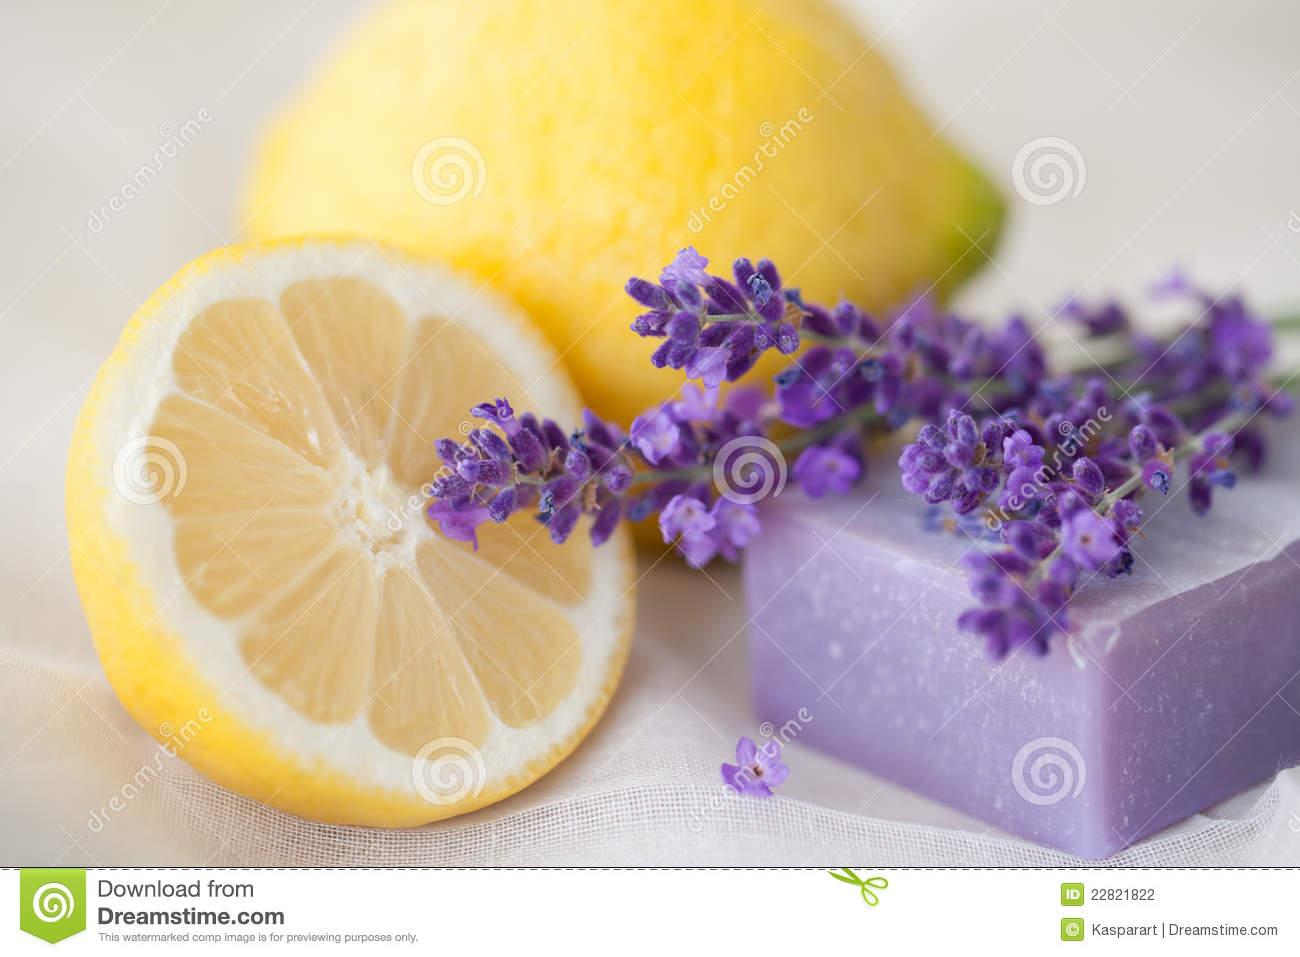 Aromatherapy Lemon Lavender 22821822 Silkmagik